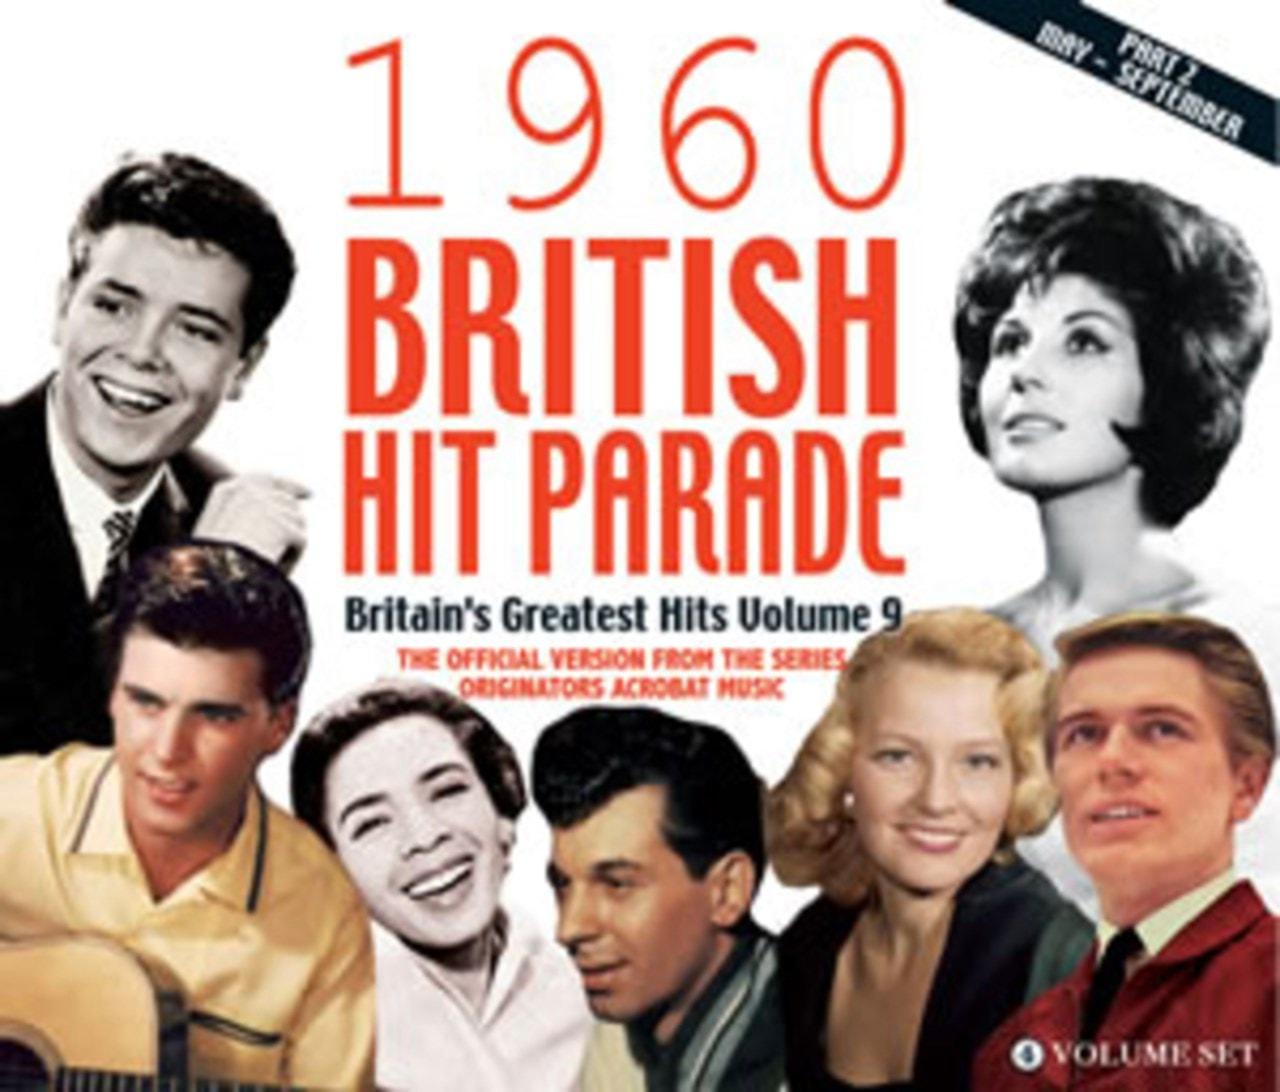 1960 British Hit Parade Part 2: Britain's Greatest Hits - Volume 9 - 1